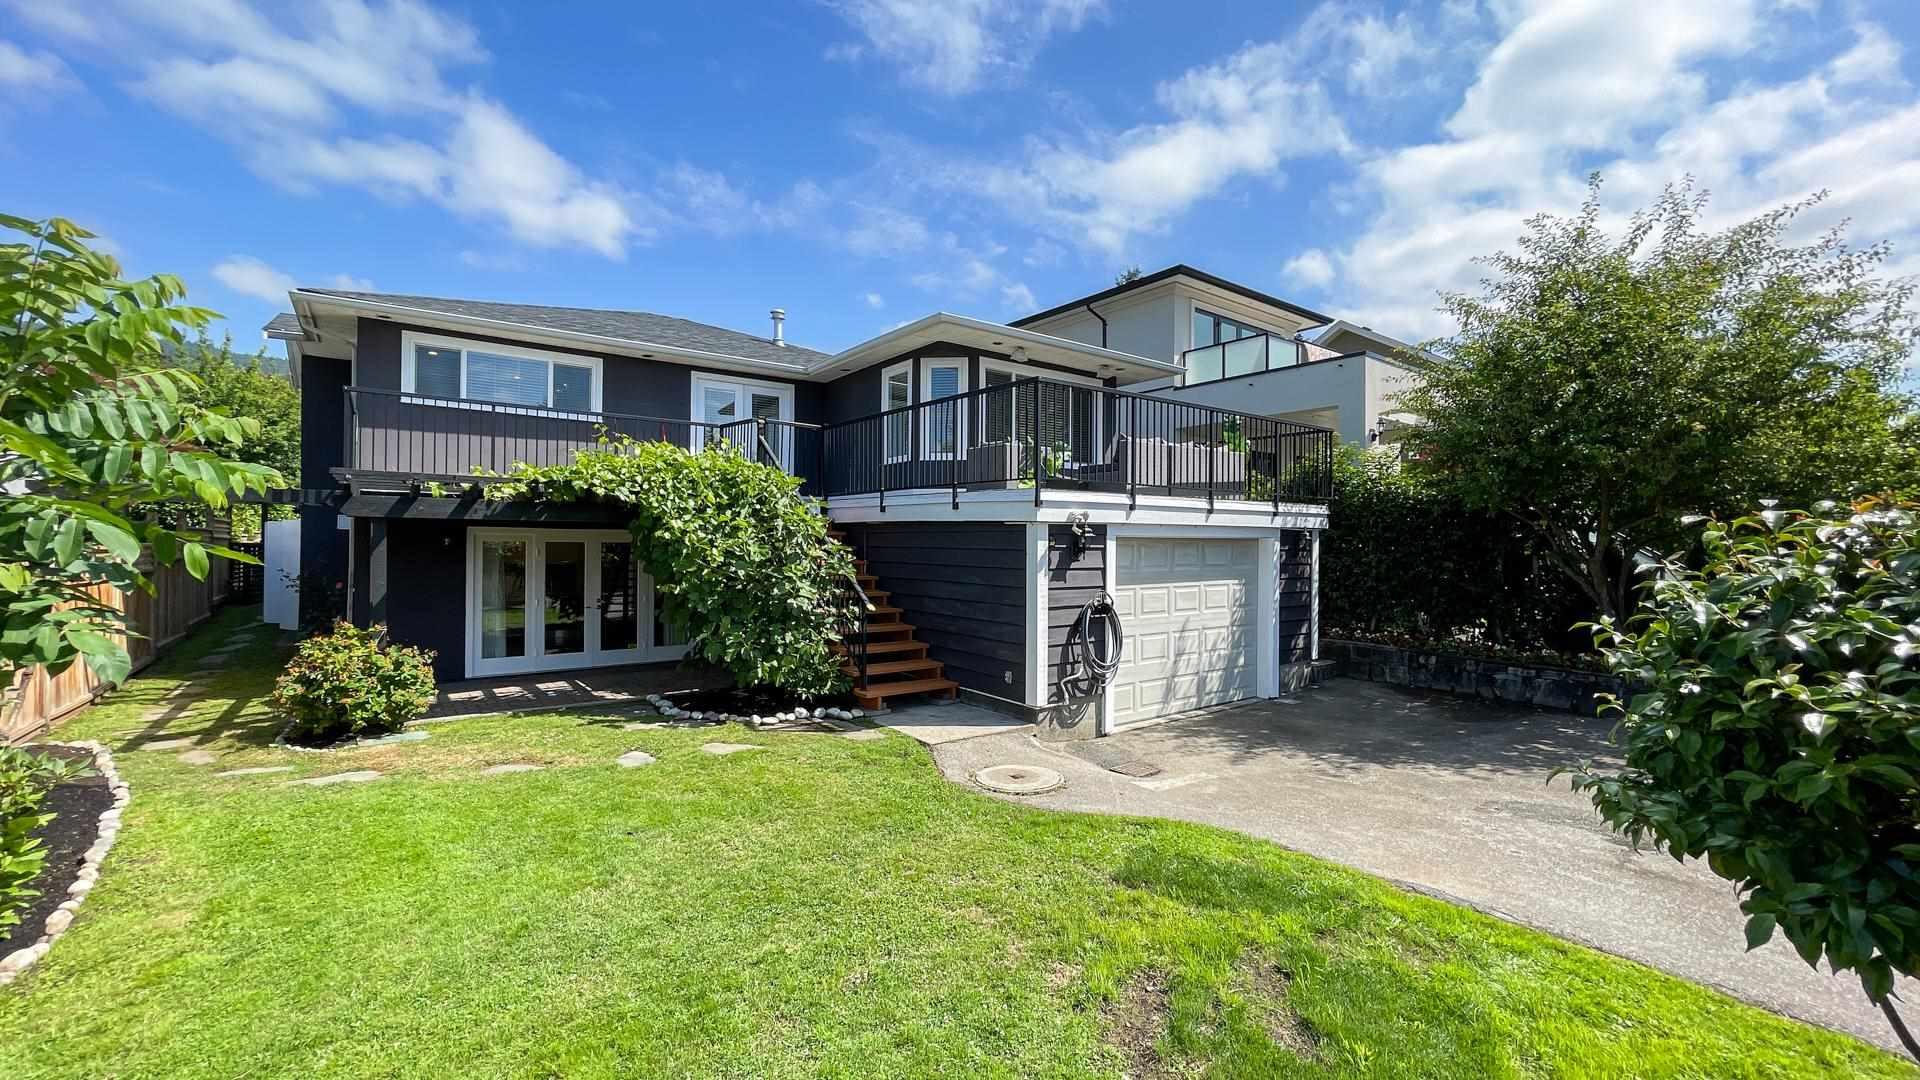 1168 JEFFERSON AVENUE - Ambleside House/Single Family for sale, 6 Bedrooms (R2602275) - #1